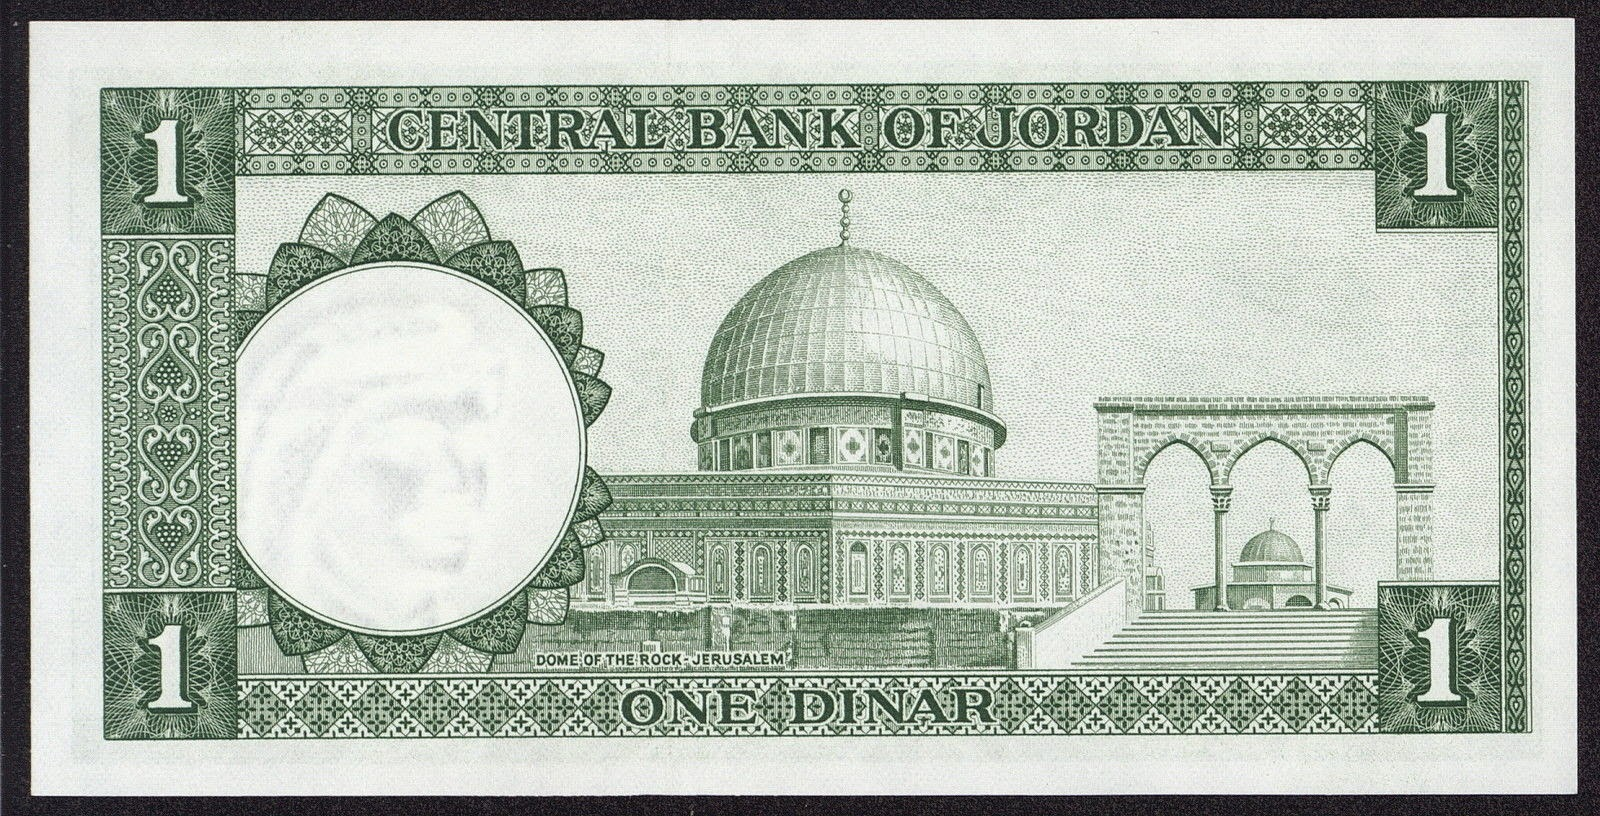 http://1.bp.blogspot.com/-UrWOmOac1rs/VQJ6wPkUyTI/AAAAAAAAGX0/IPj5dAMJSUE/s1600/Jordanian%2BDinar%2Bbanknote%2B1959.JPG